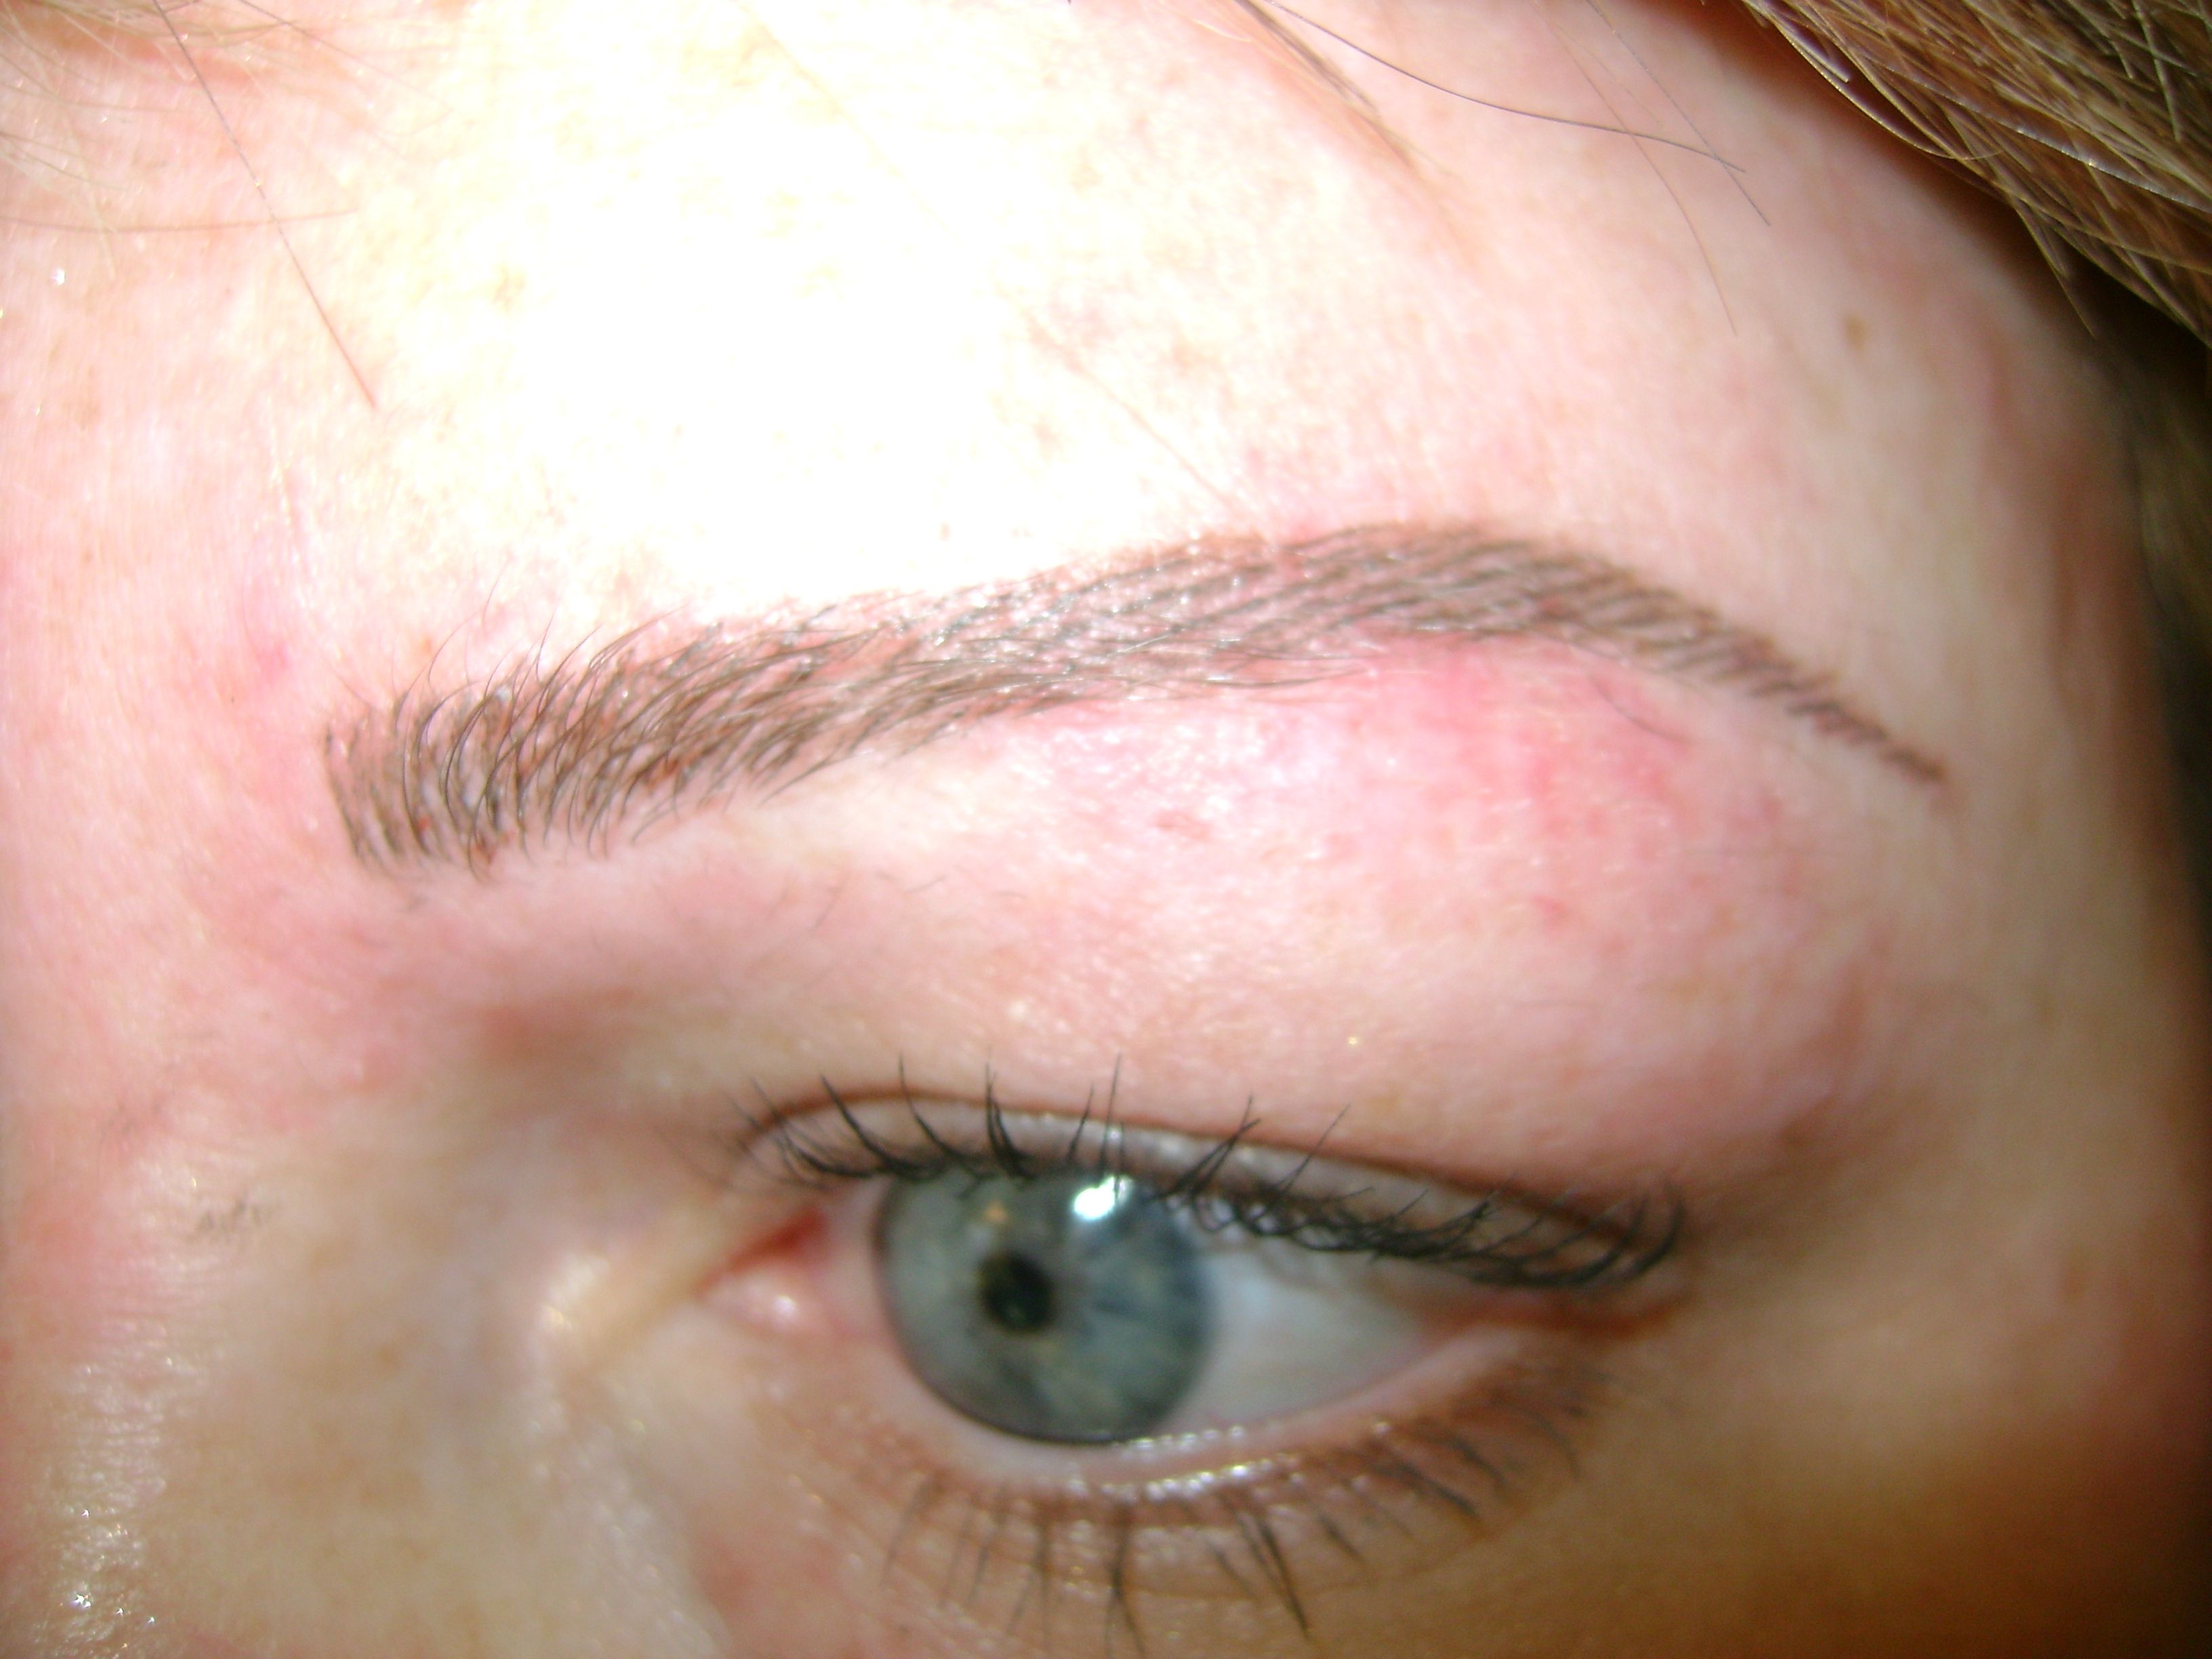 Eyebrow tattoo before and after eyebrow tattoo eyebrows